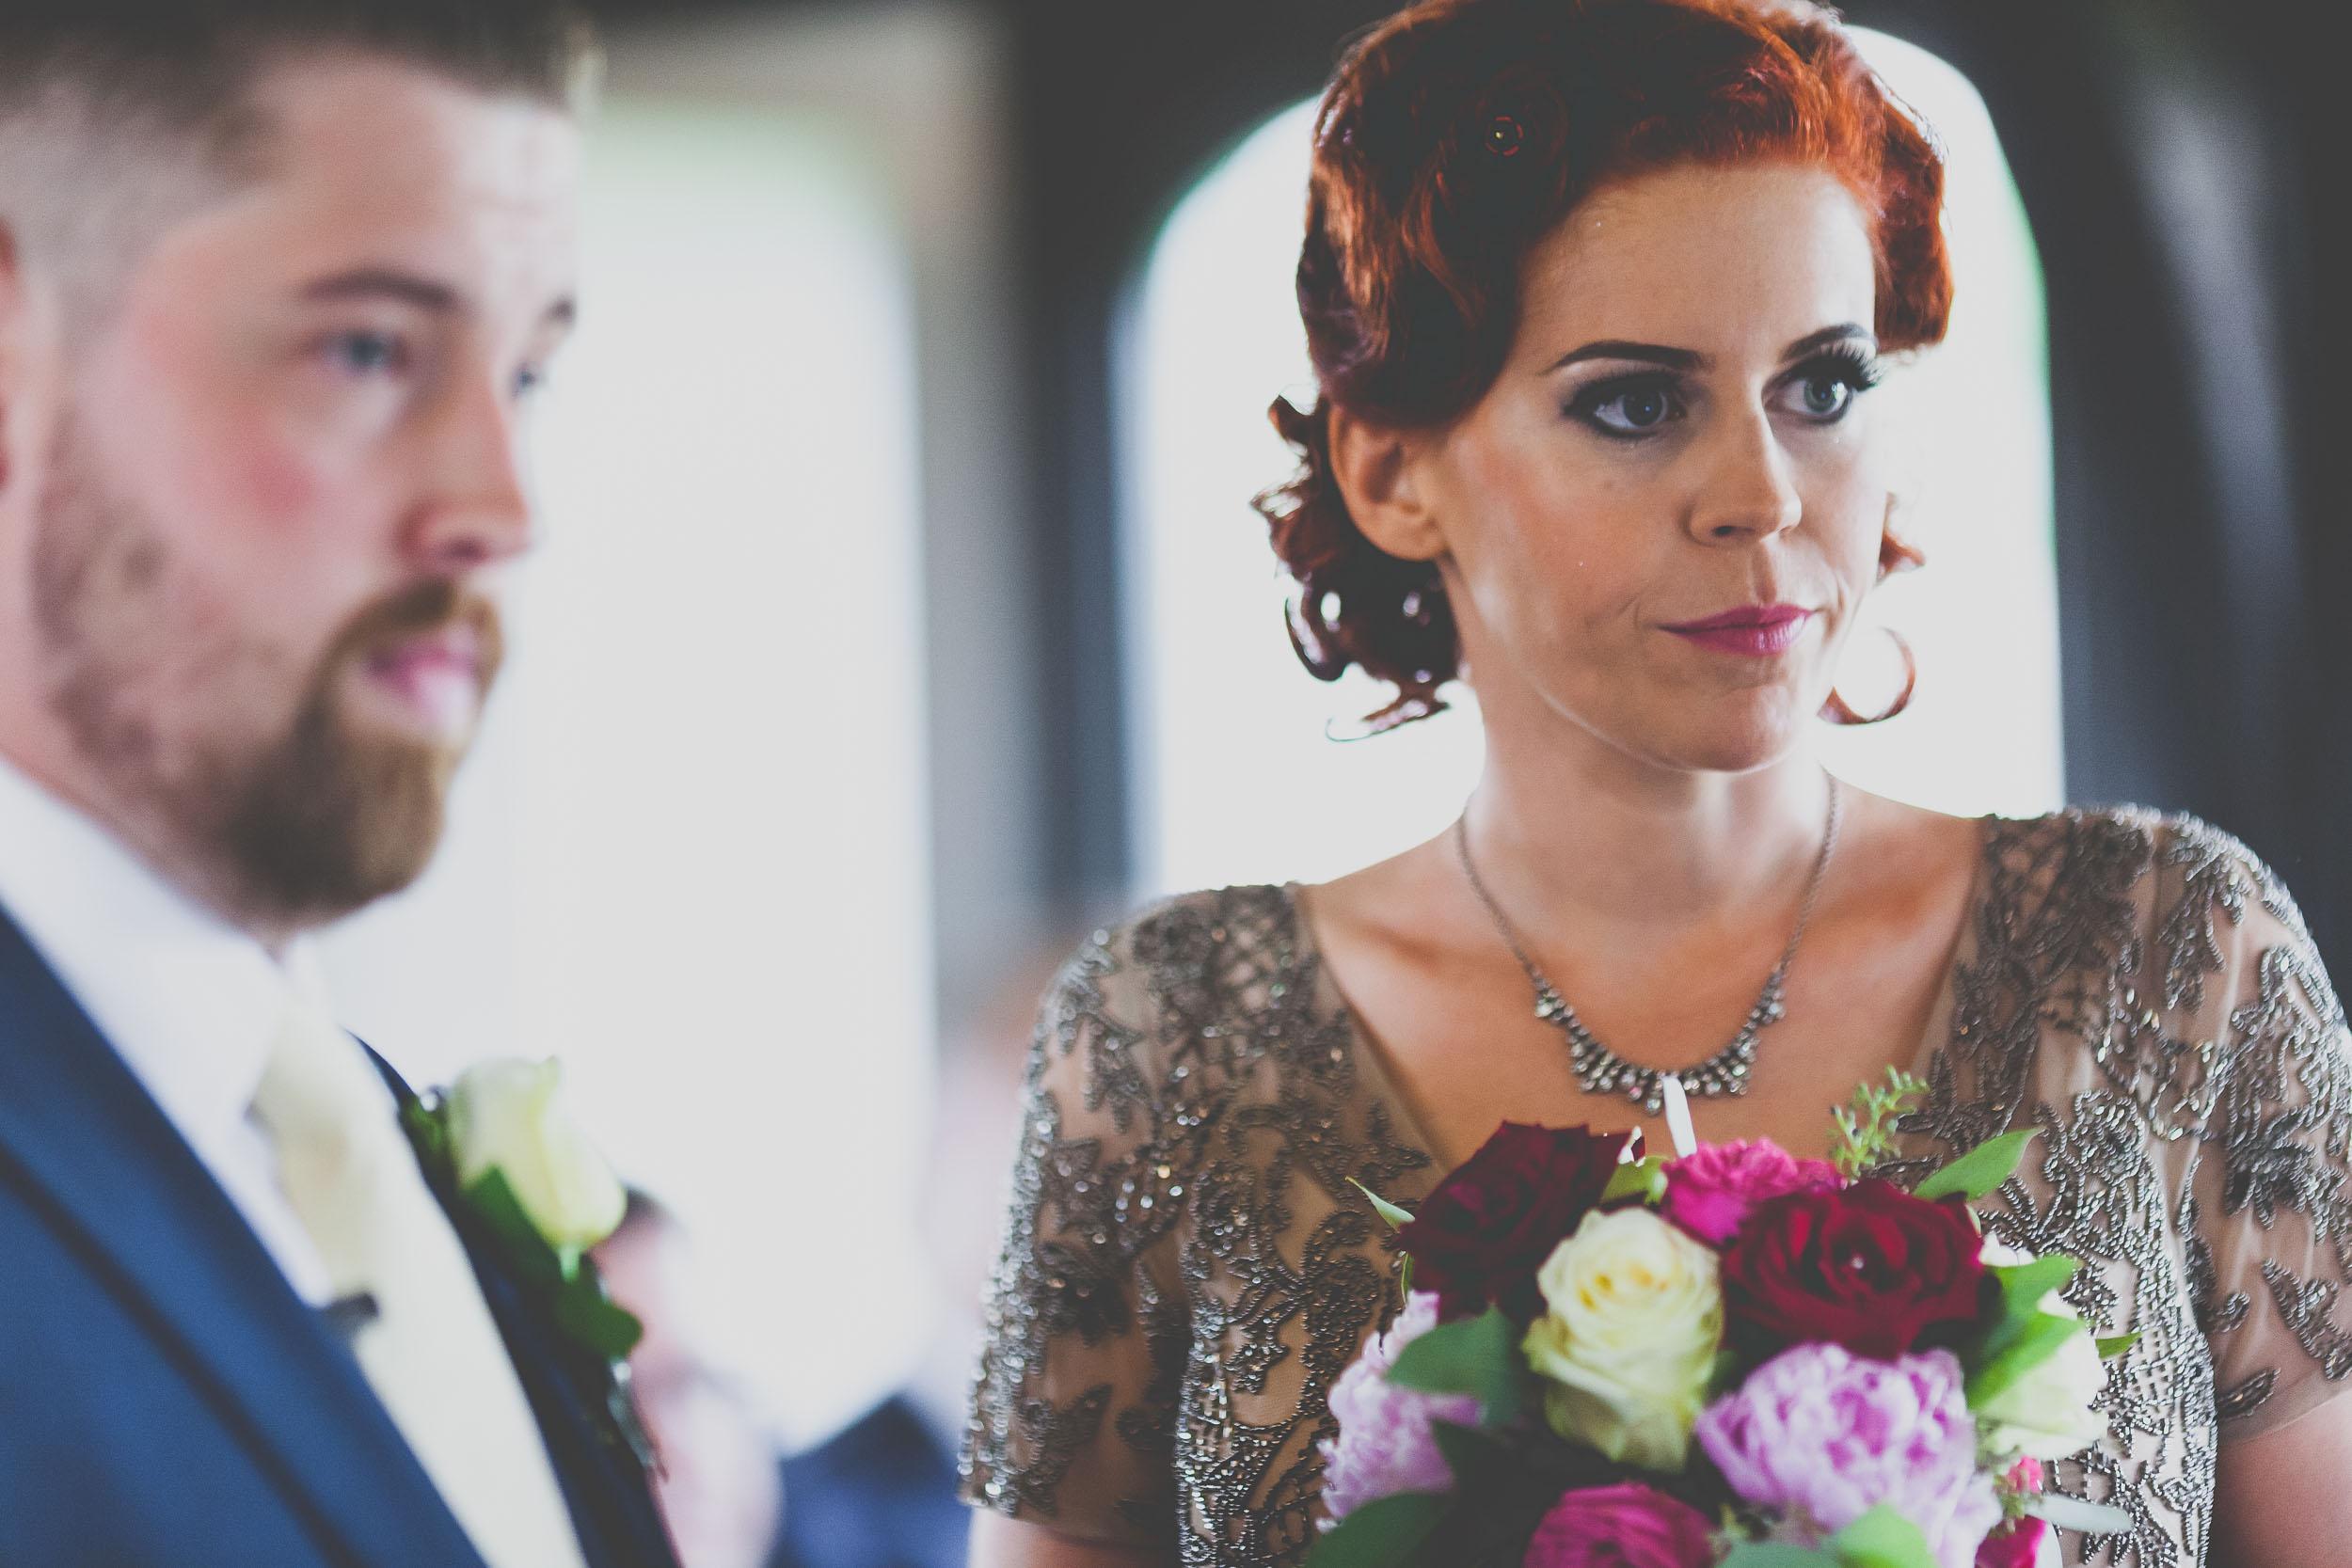 queen-elizabeths-hunting-lodge-epping-forest-wedding063.jpg